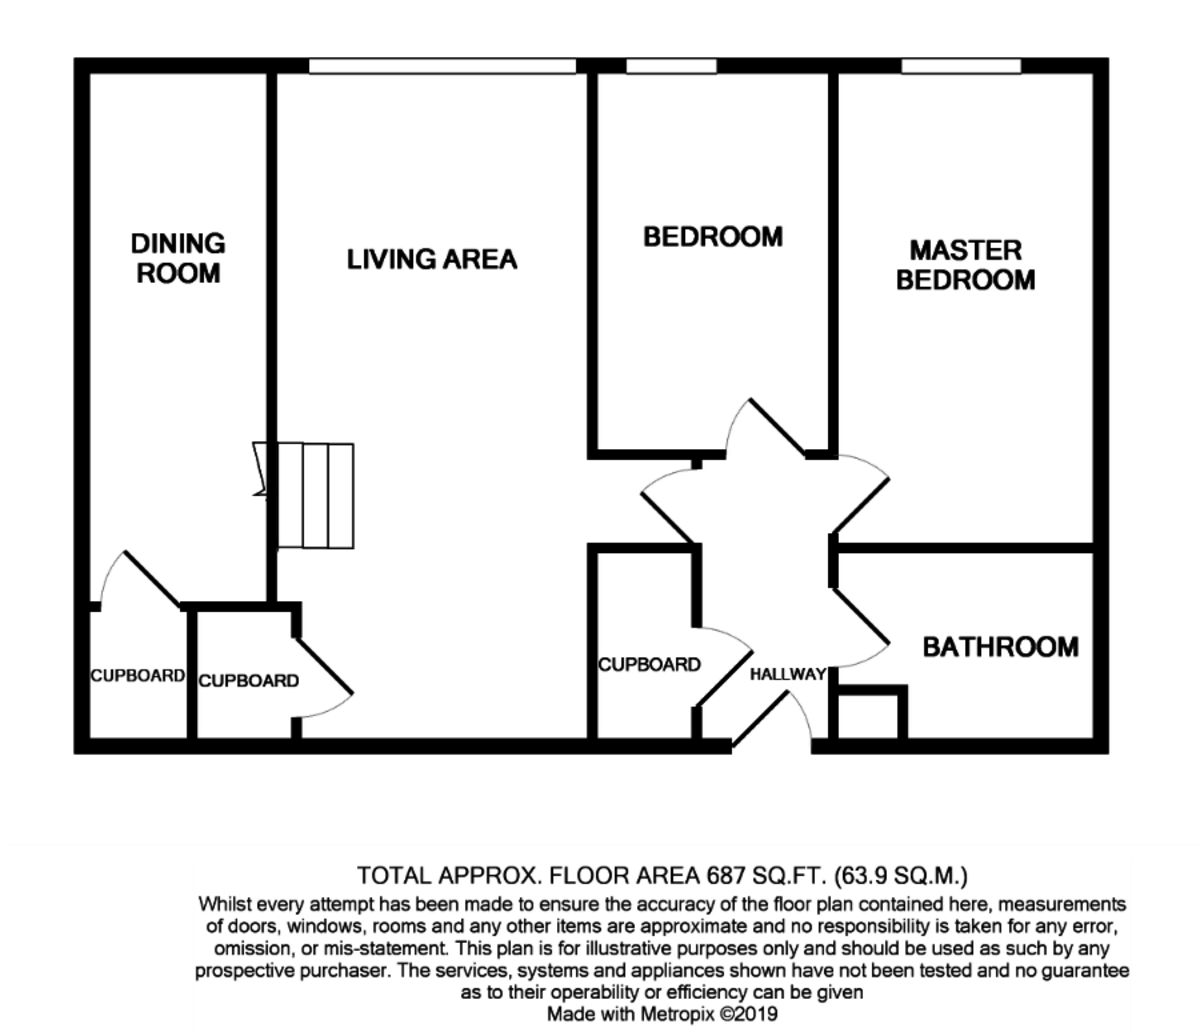 Sapphire Heights, 30 Tenby Street North, Birmingham City Centre floorplan 1 of 1